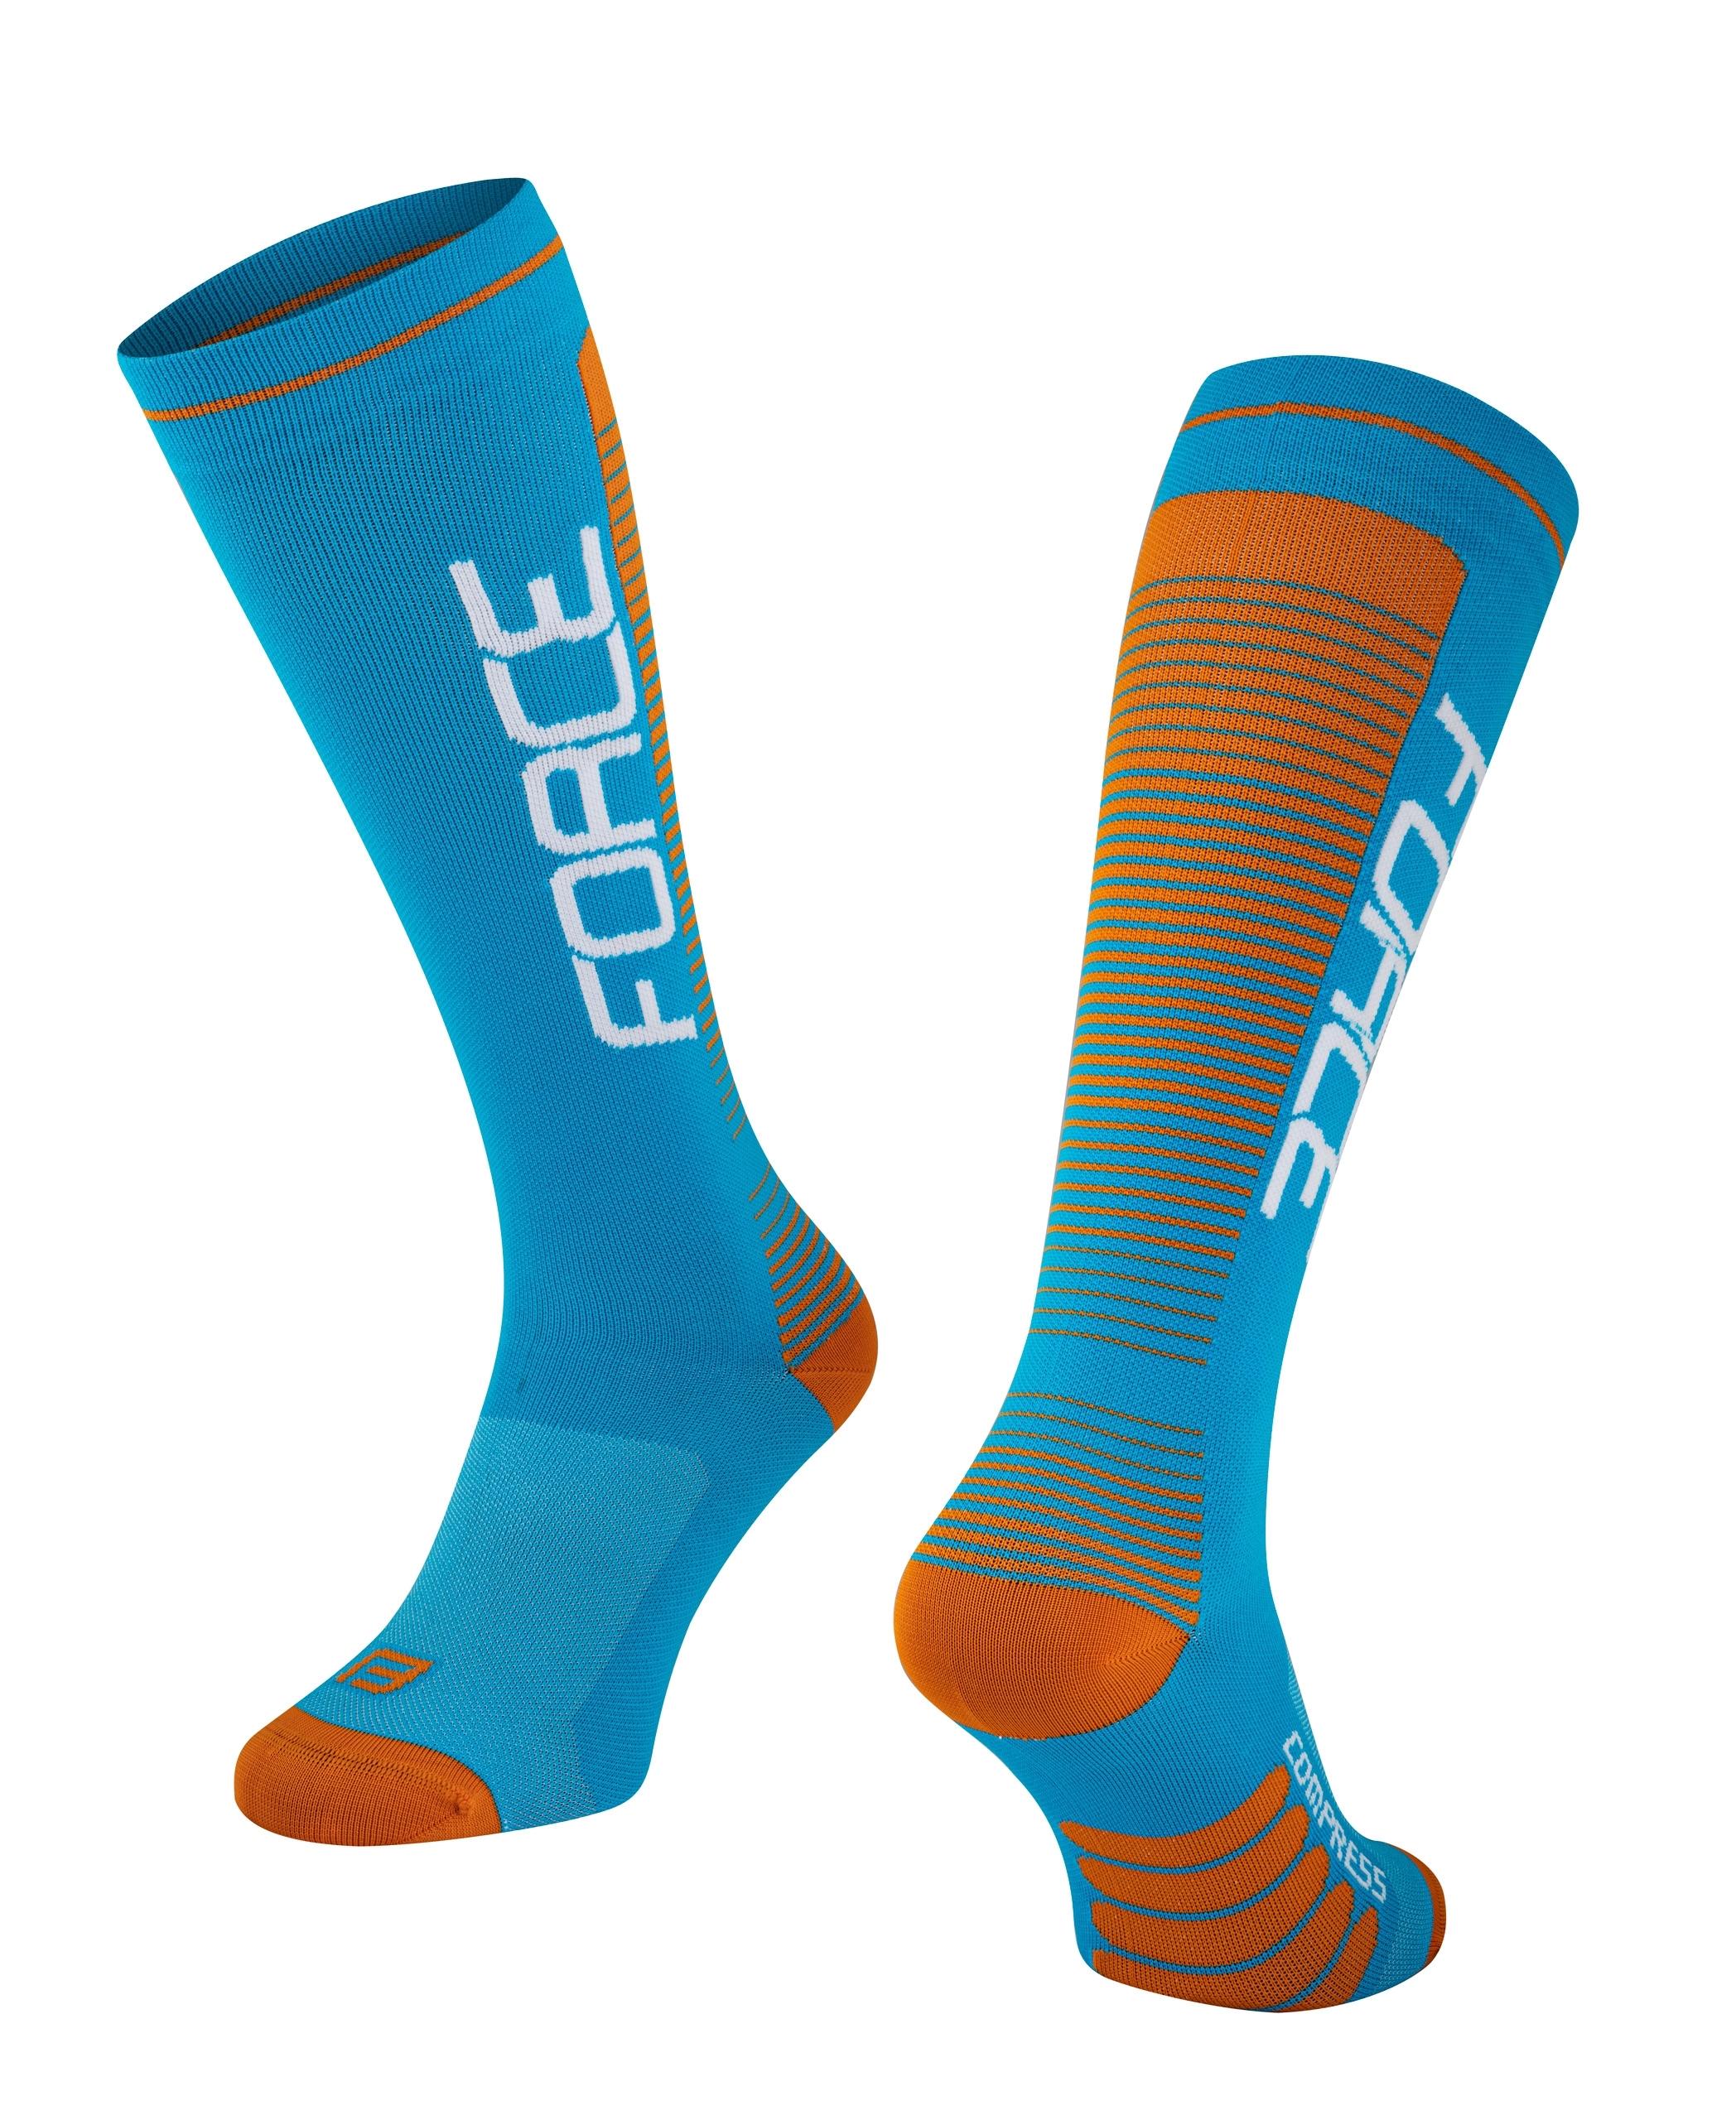 ponožky F COMPRESS, modro-oranžové S-M/36-41